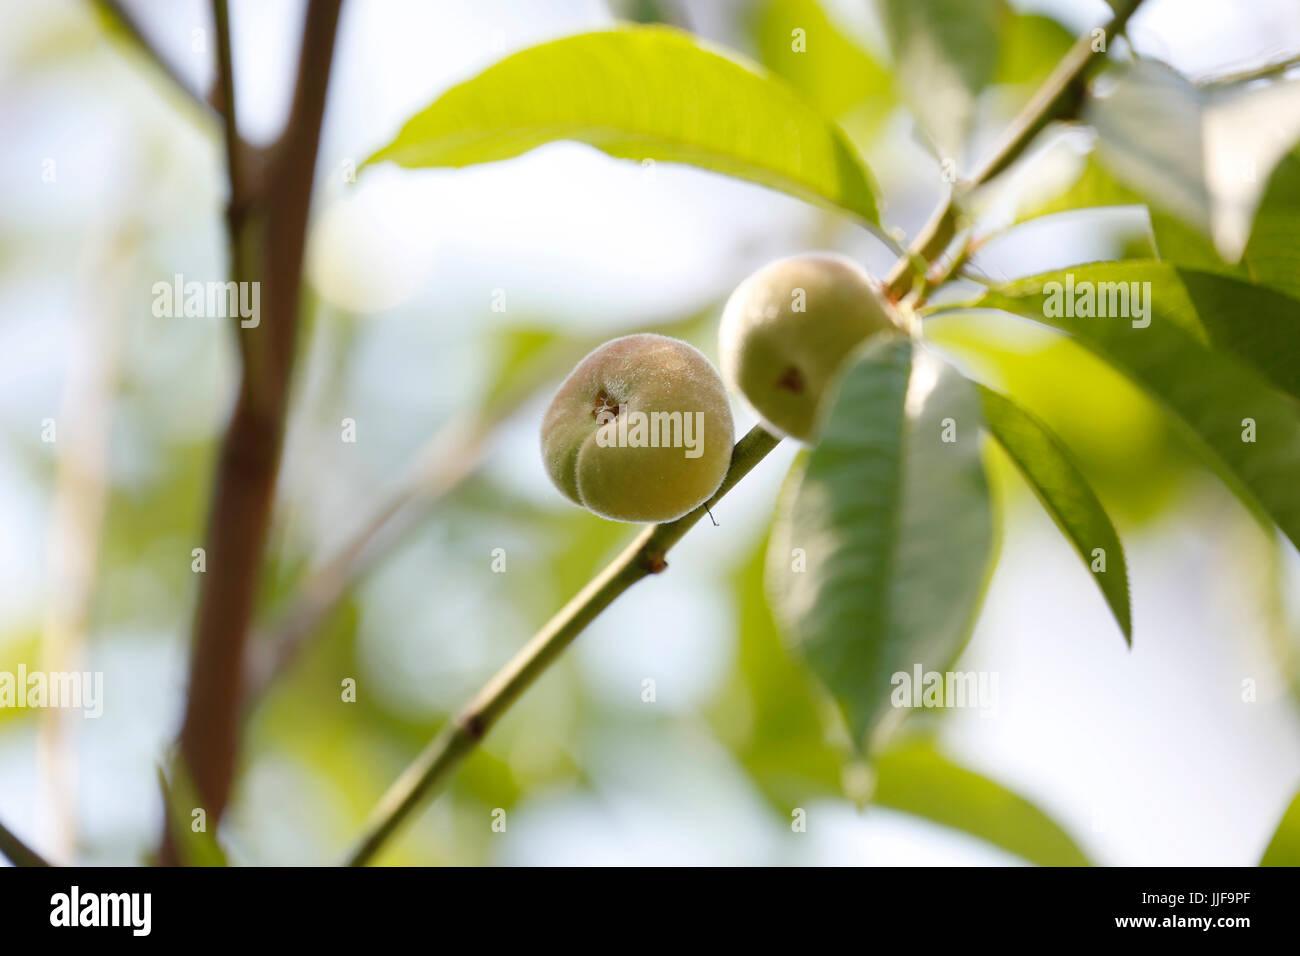 Prunus persica - Peach Stark Saturn - Stock Image